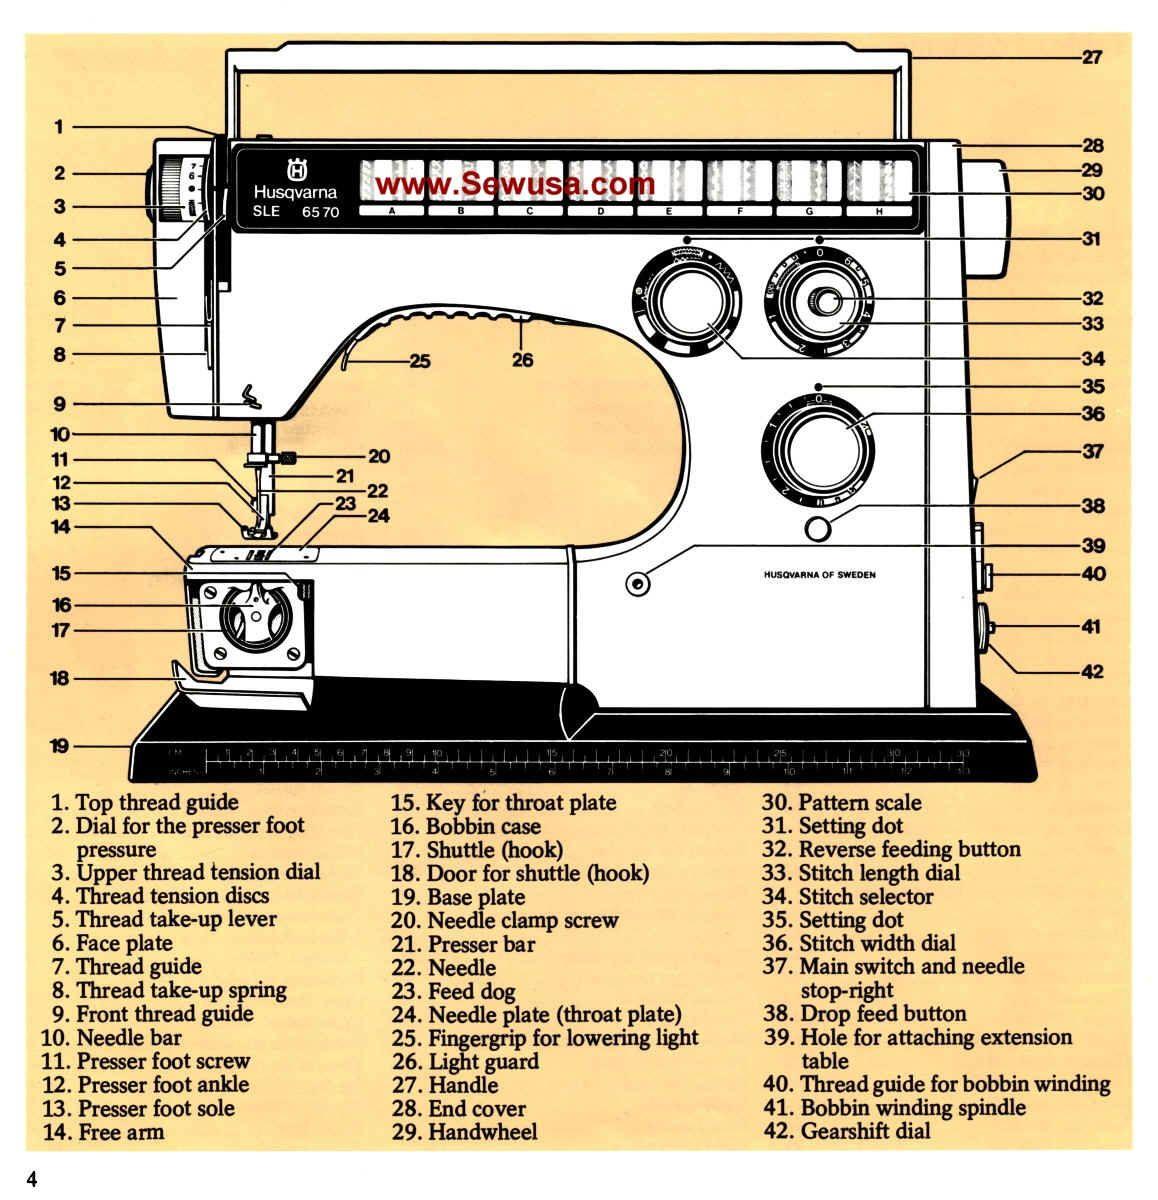 Viking Sewing Machine Diagram Threading Sle Instruction Manual Machines Hacks 1158x1200